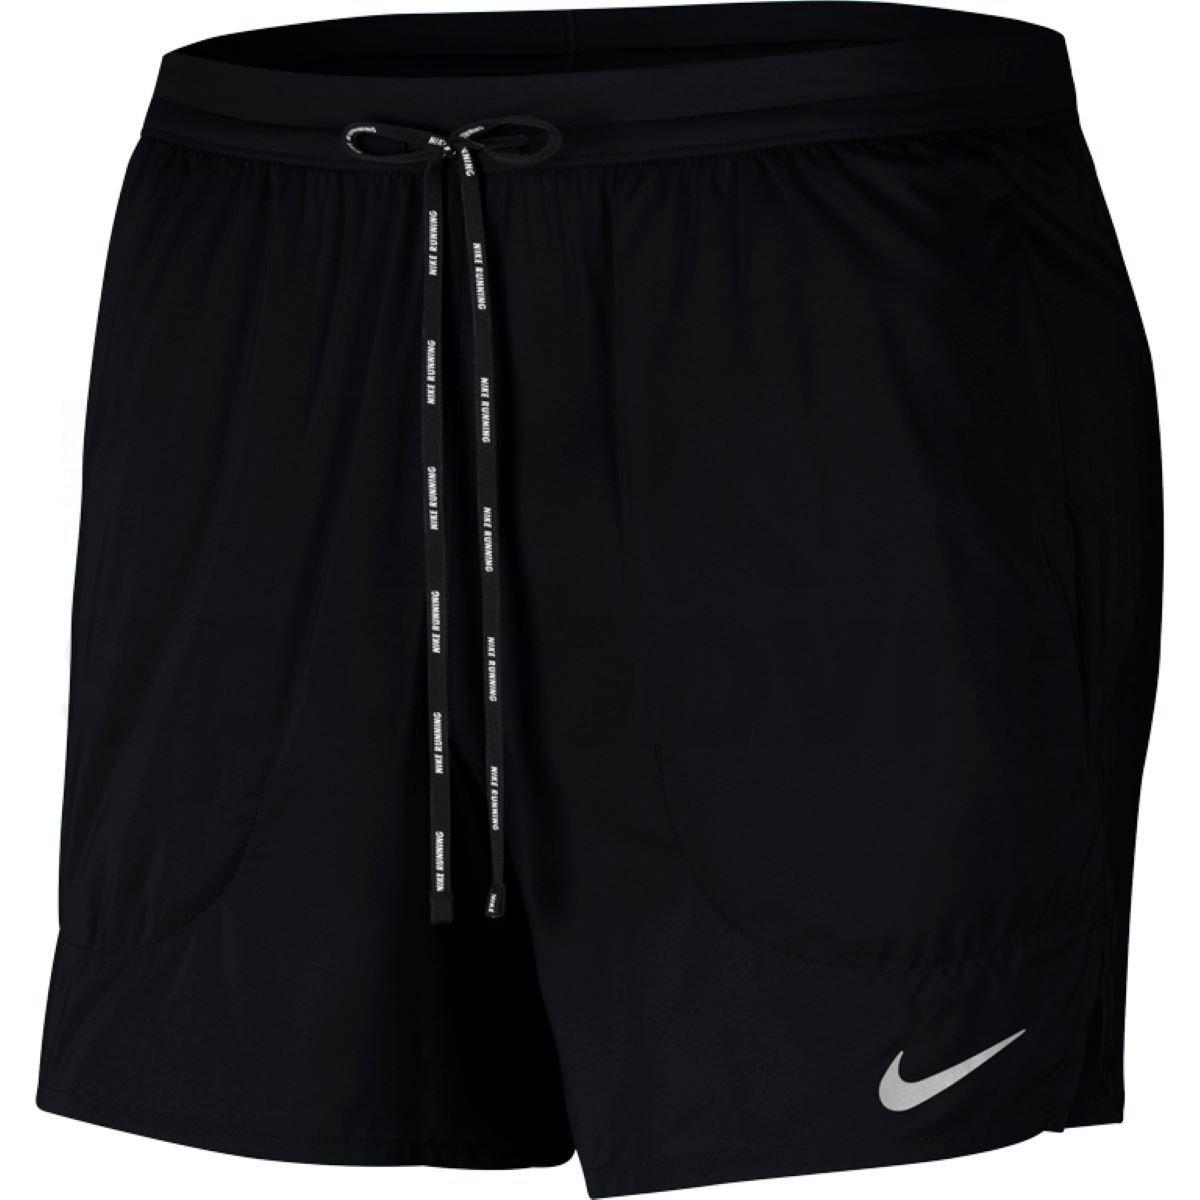 cj5453-010-nike-flex-stride-men-13cm-brief-running-shorts-019-829414